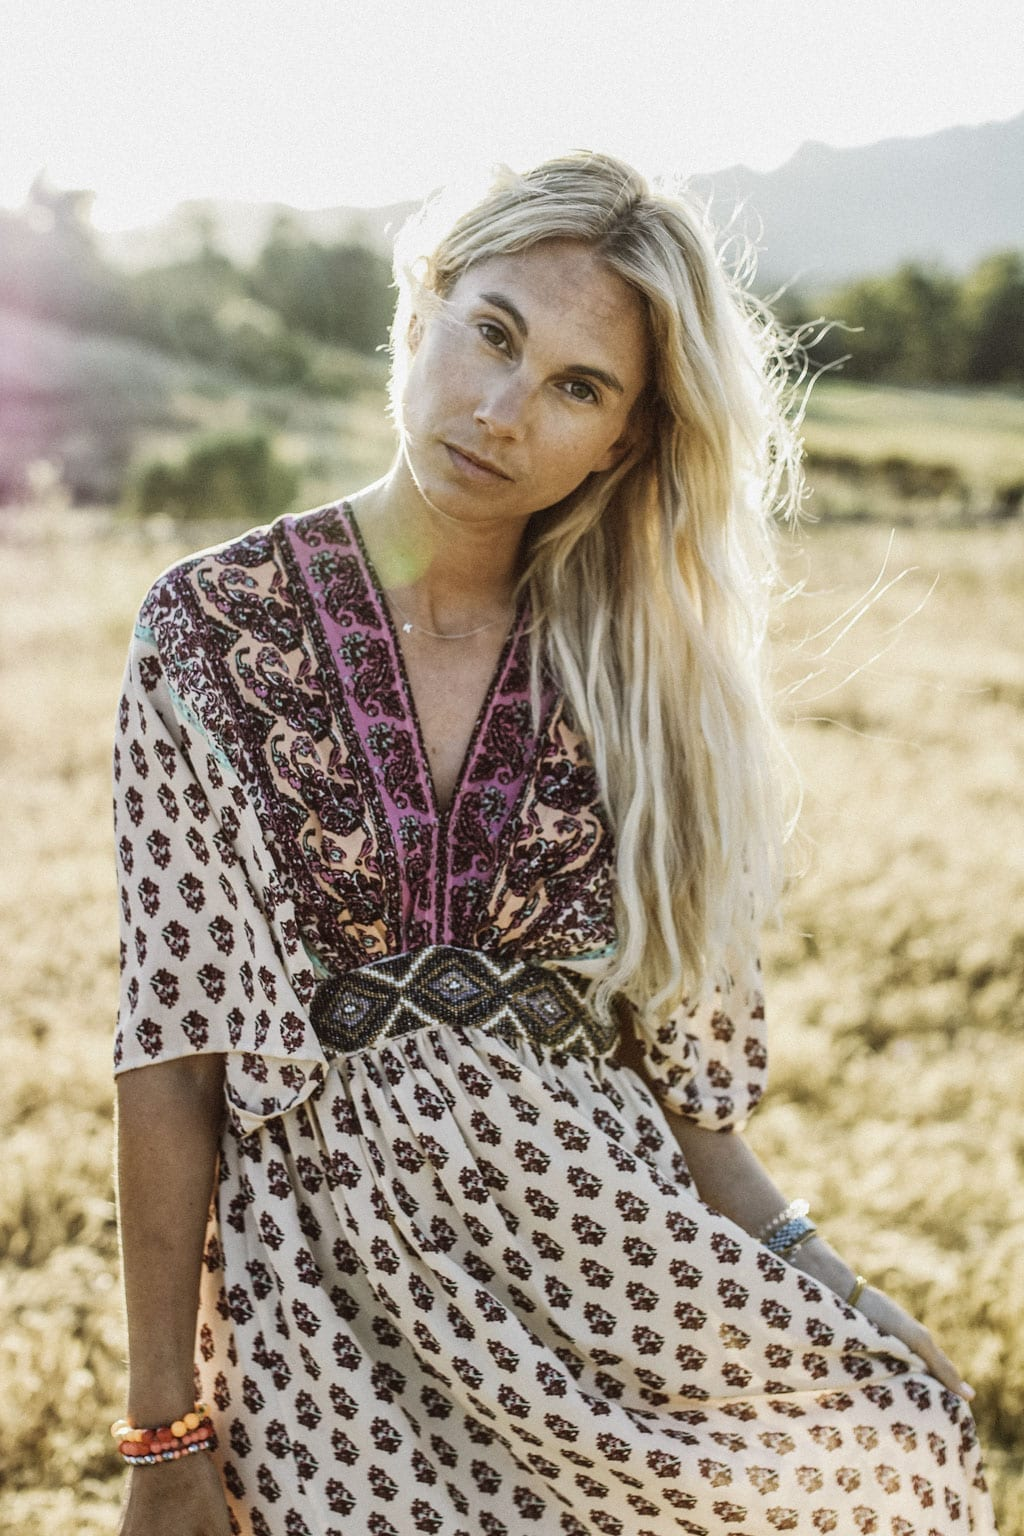 CK-1606_Sardinien-Sardegna-Sardinia-Italy-Italia-Fashion-Blog-Sun-Down-Dress-Blonde-Karin-Kaswurm-9822